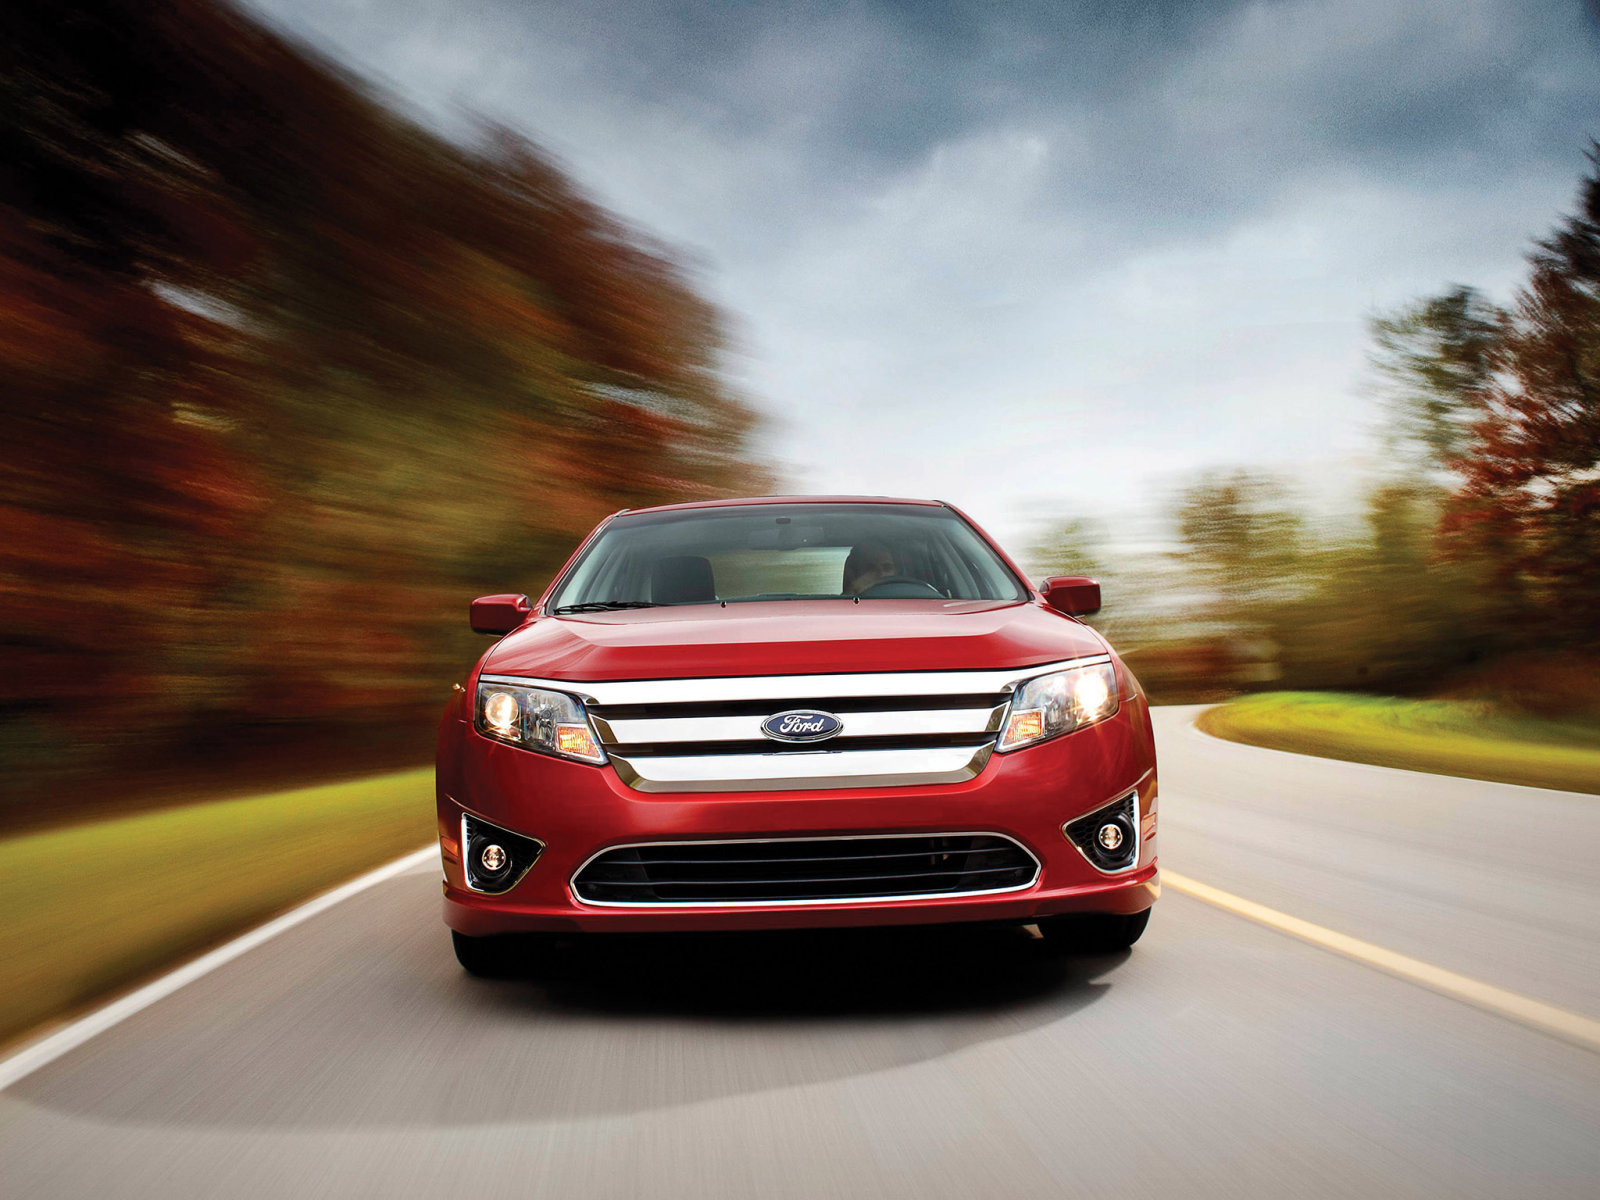 Ford fusion usa форд фьюжн usa 2009 2012 седан